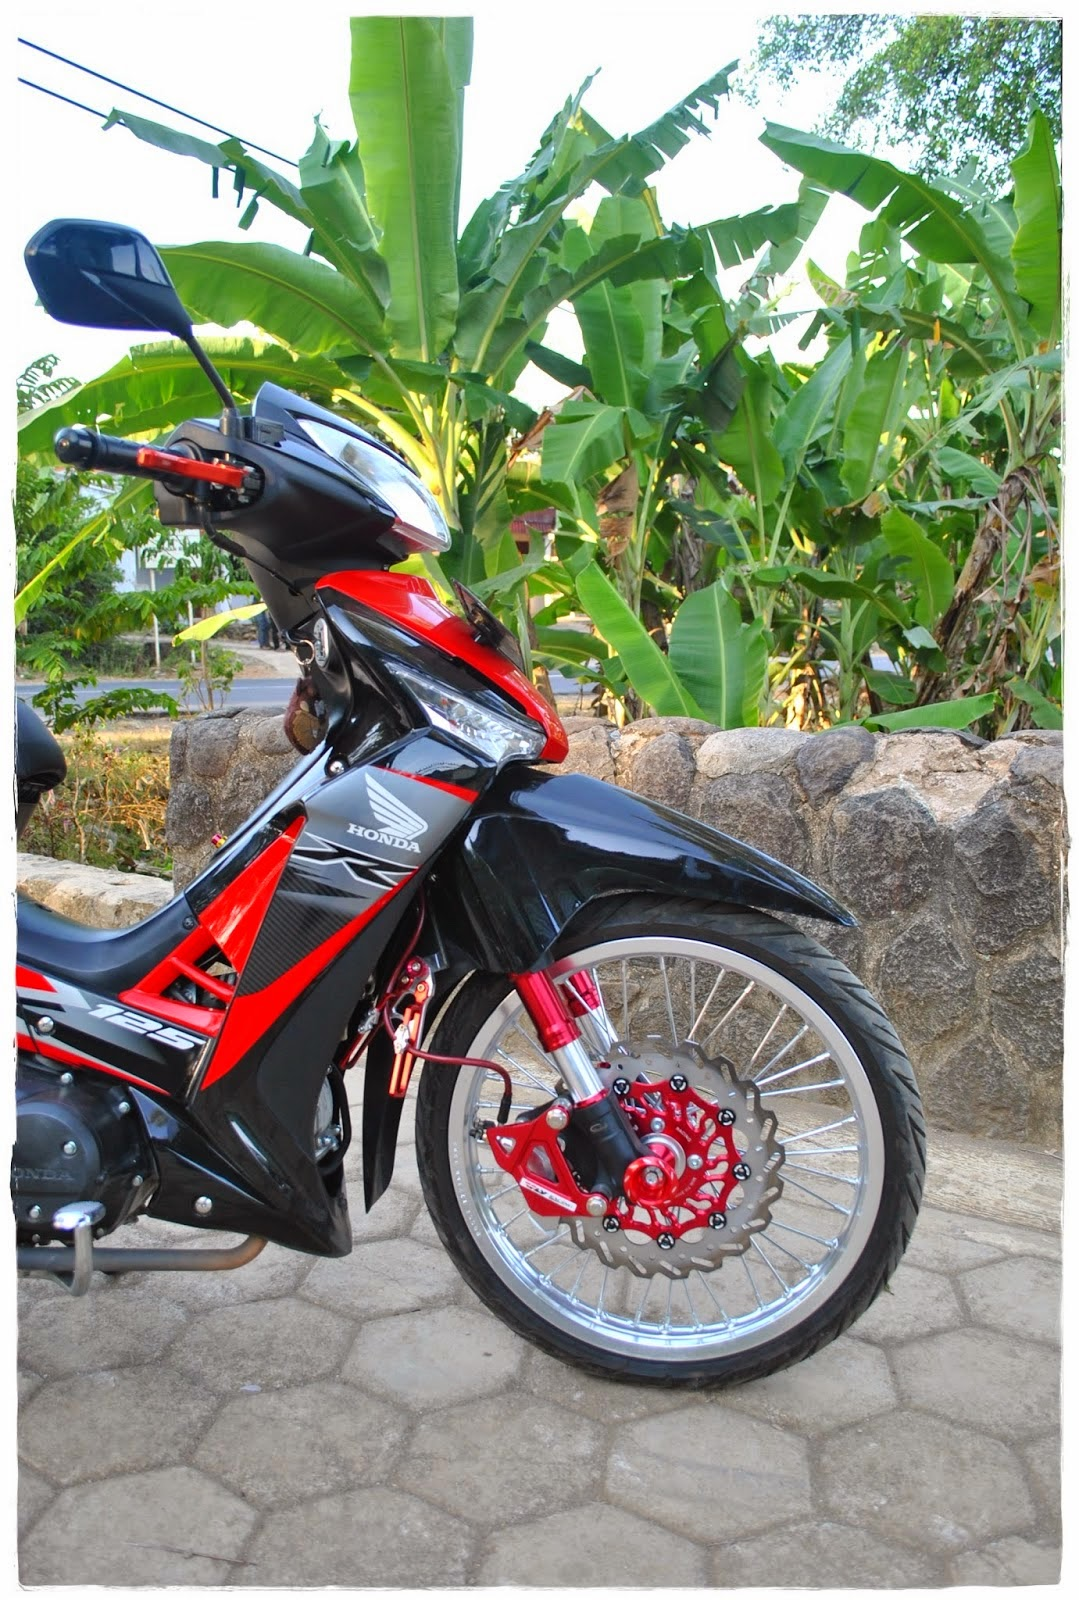 Modifikasi Honda Supra X 125 Minimalis